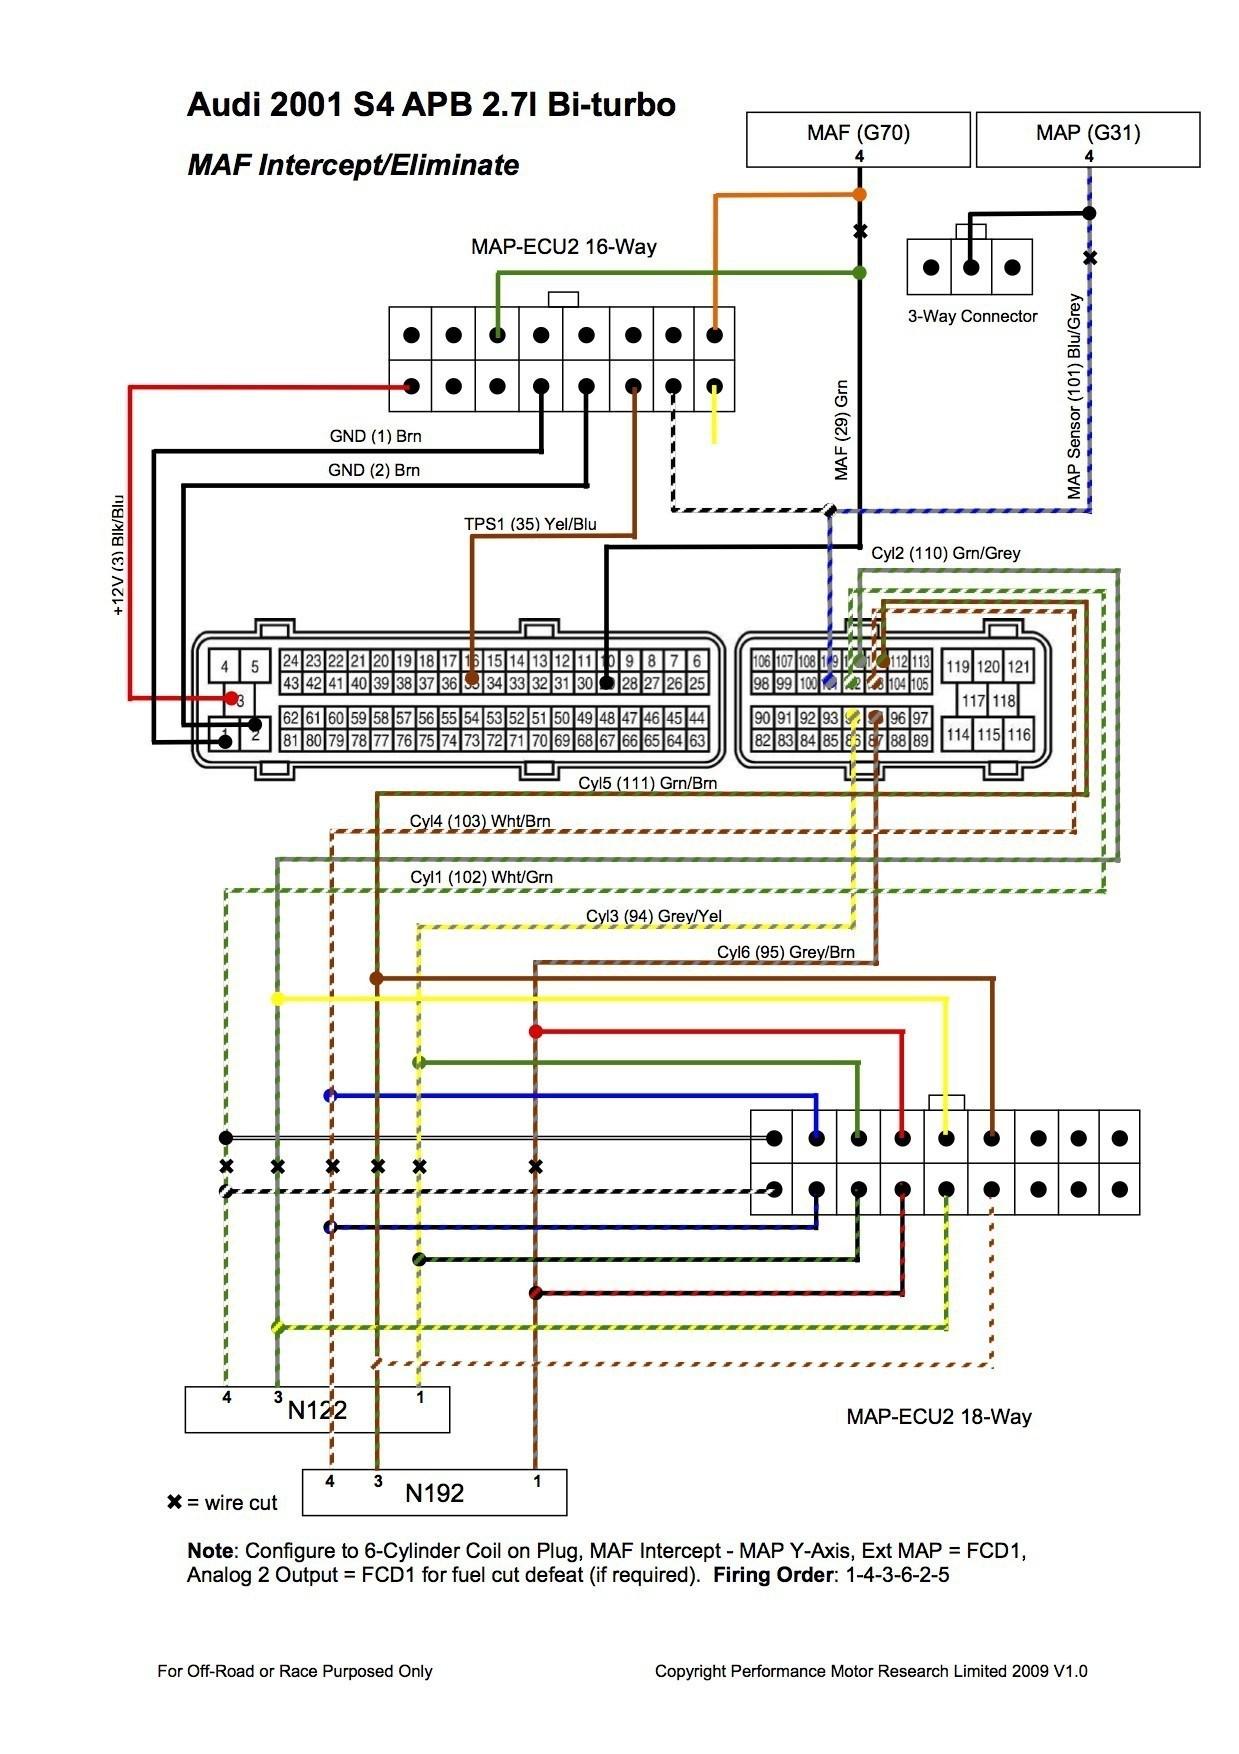 Dodge Roadtrek 190 Wiring Diagram - wiring diagram cycle-speed -  cycle-speed.teglieromane.itTeglie Romane